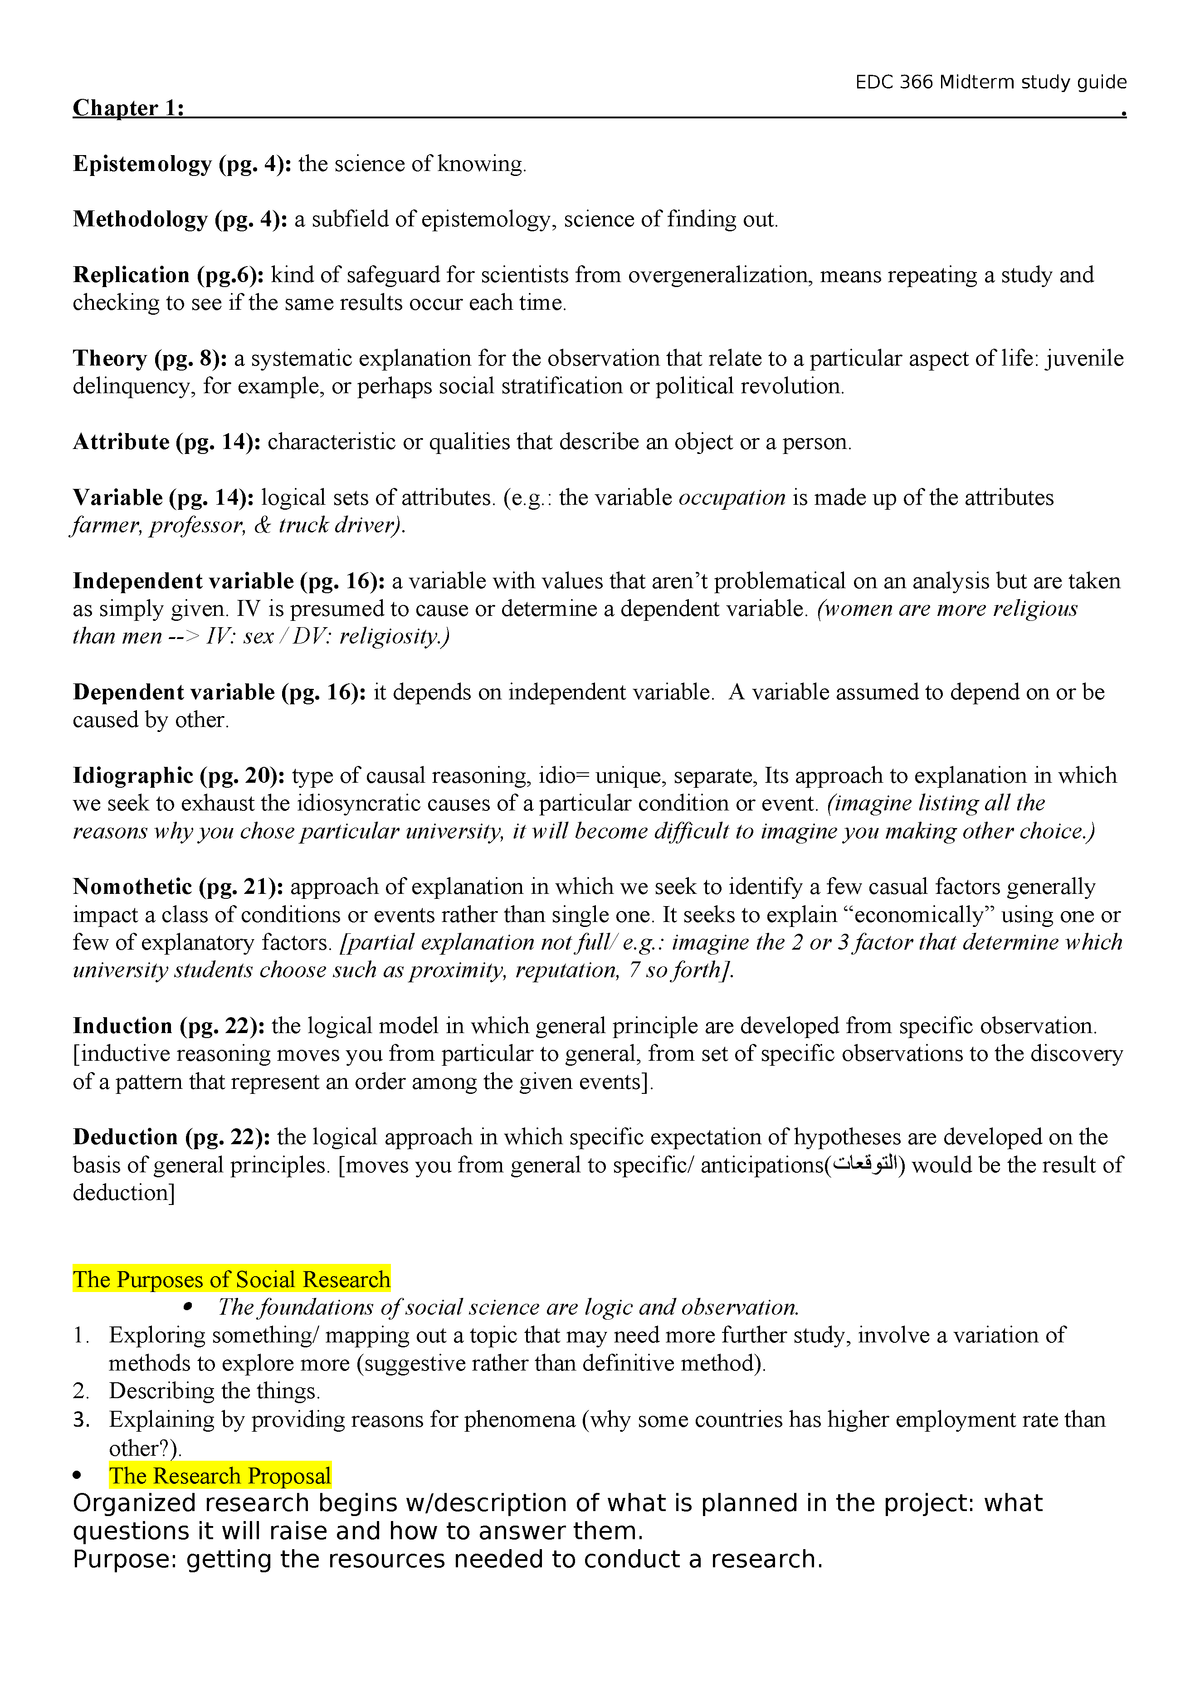 Summary The Basics of Social Research 10 Apr 2018 - StuDocu